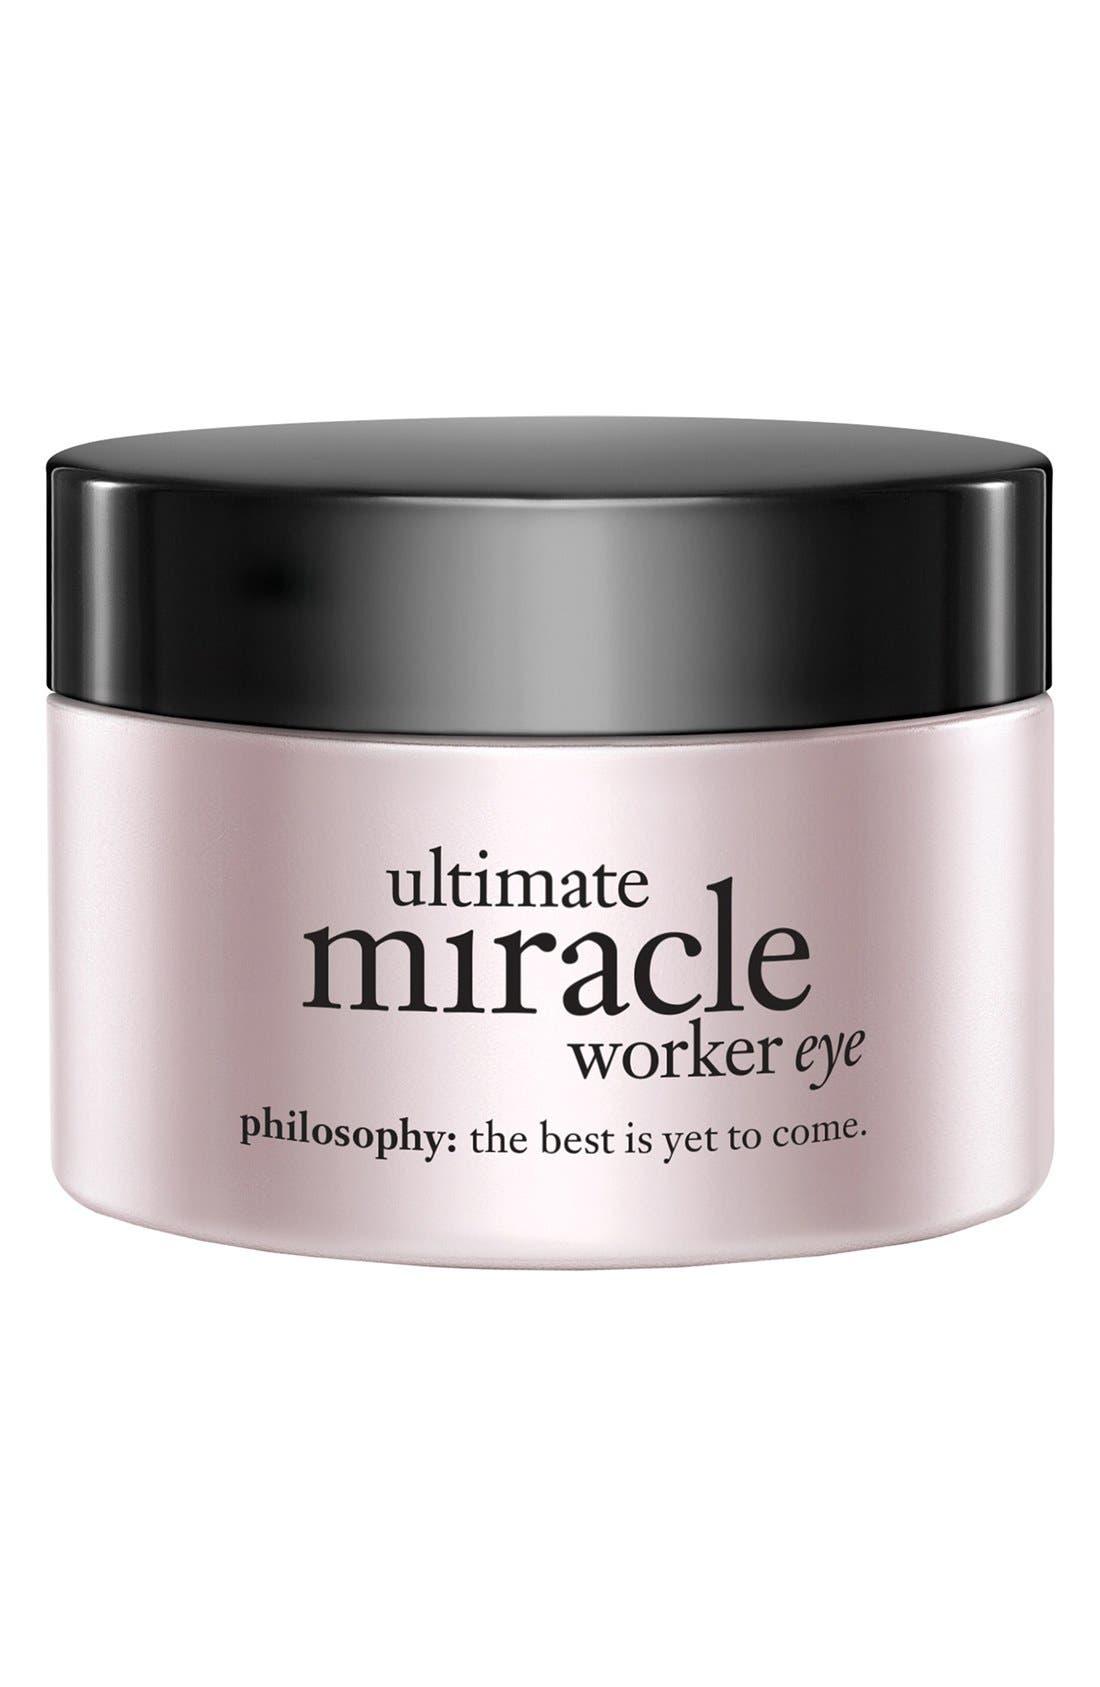 PHILOSOPHY, 'ultimate miracle worker eye' multi-rejuvenating eye cream broad spectrum SPF 15, Main thumbnail 1, color, NO COLOR